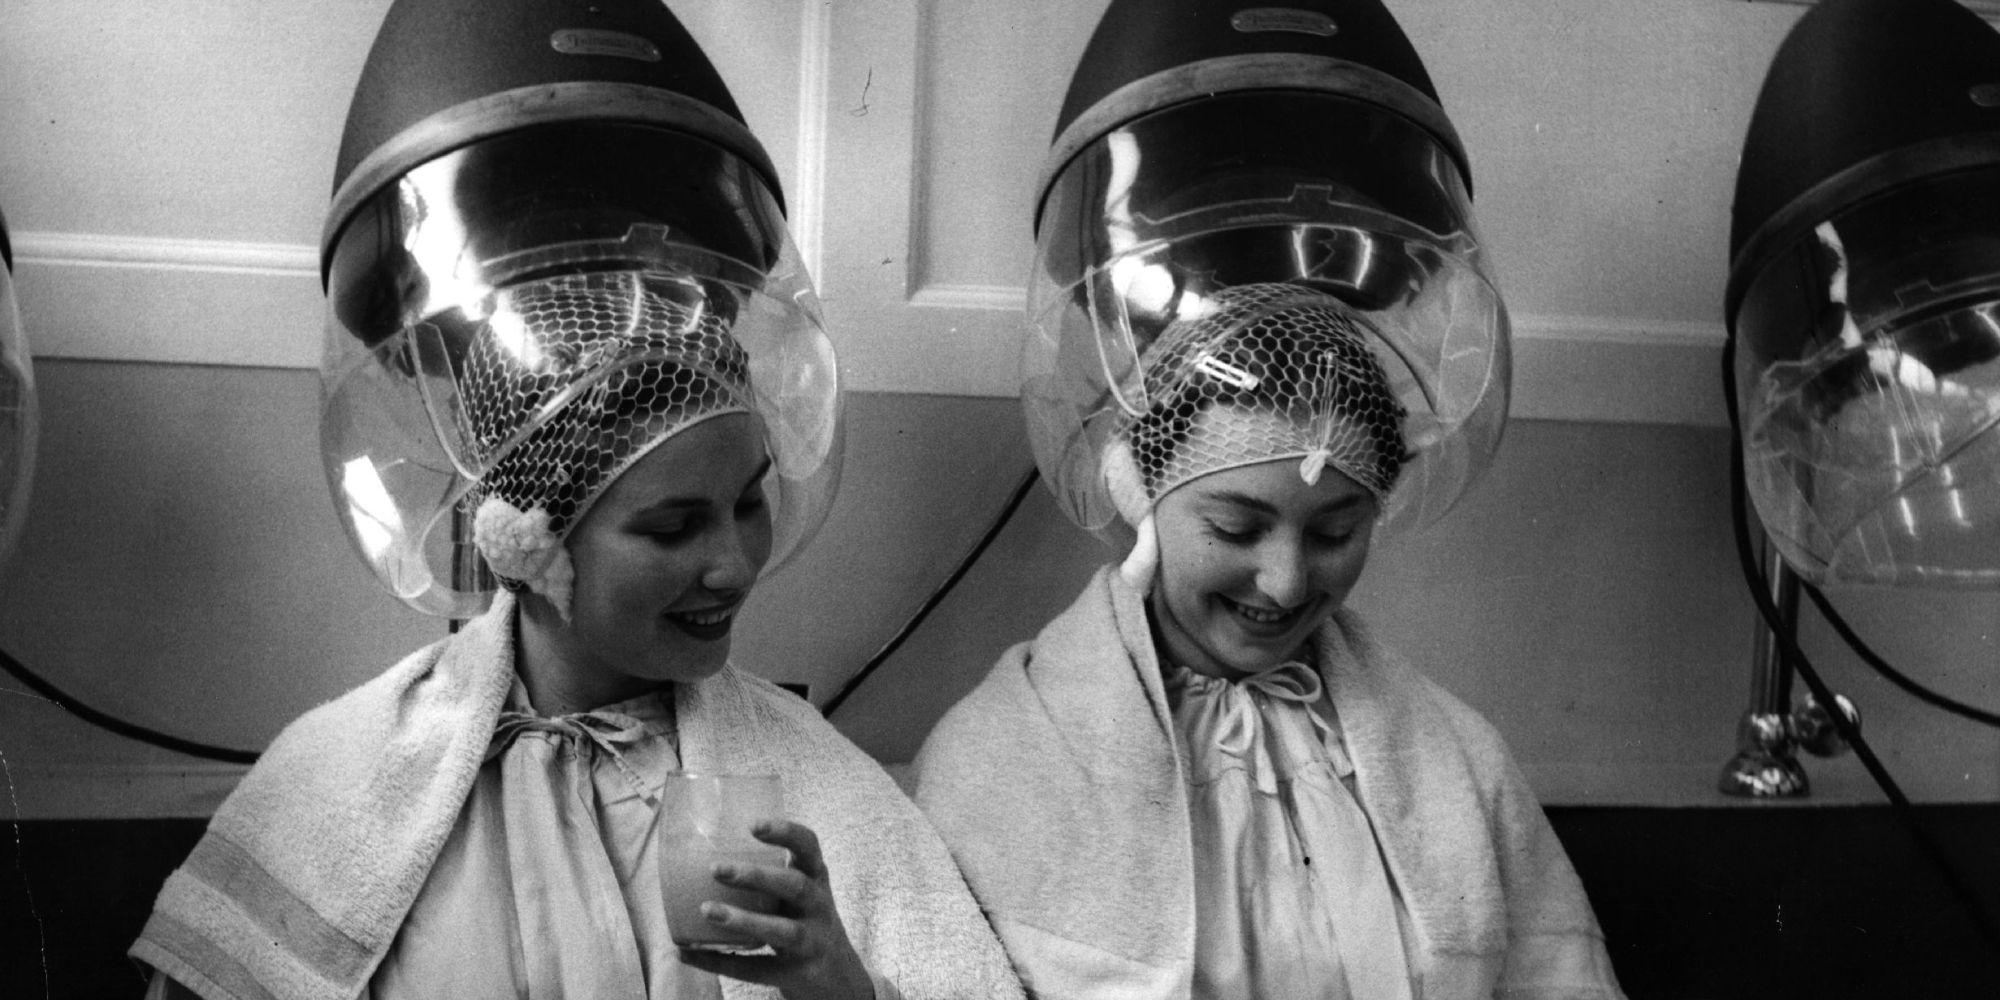 N Style Hair Salon Kernersville: These Vintage Hair Dryer Photos Make It Seem Cool Under